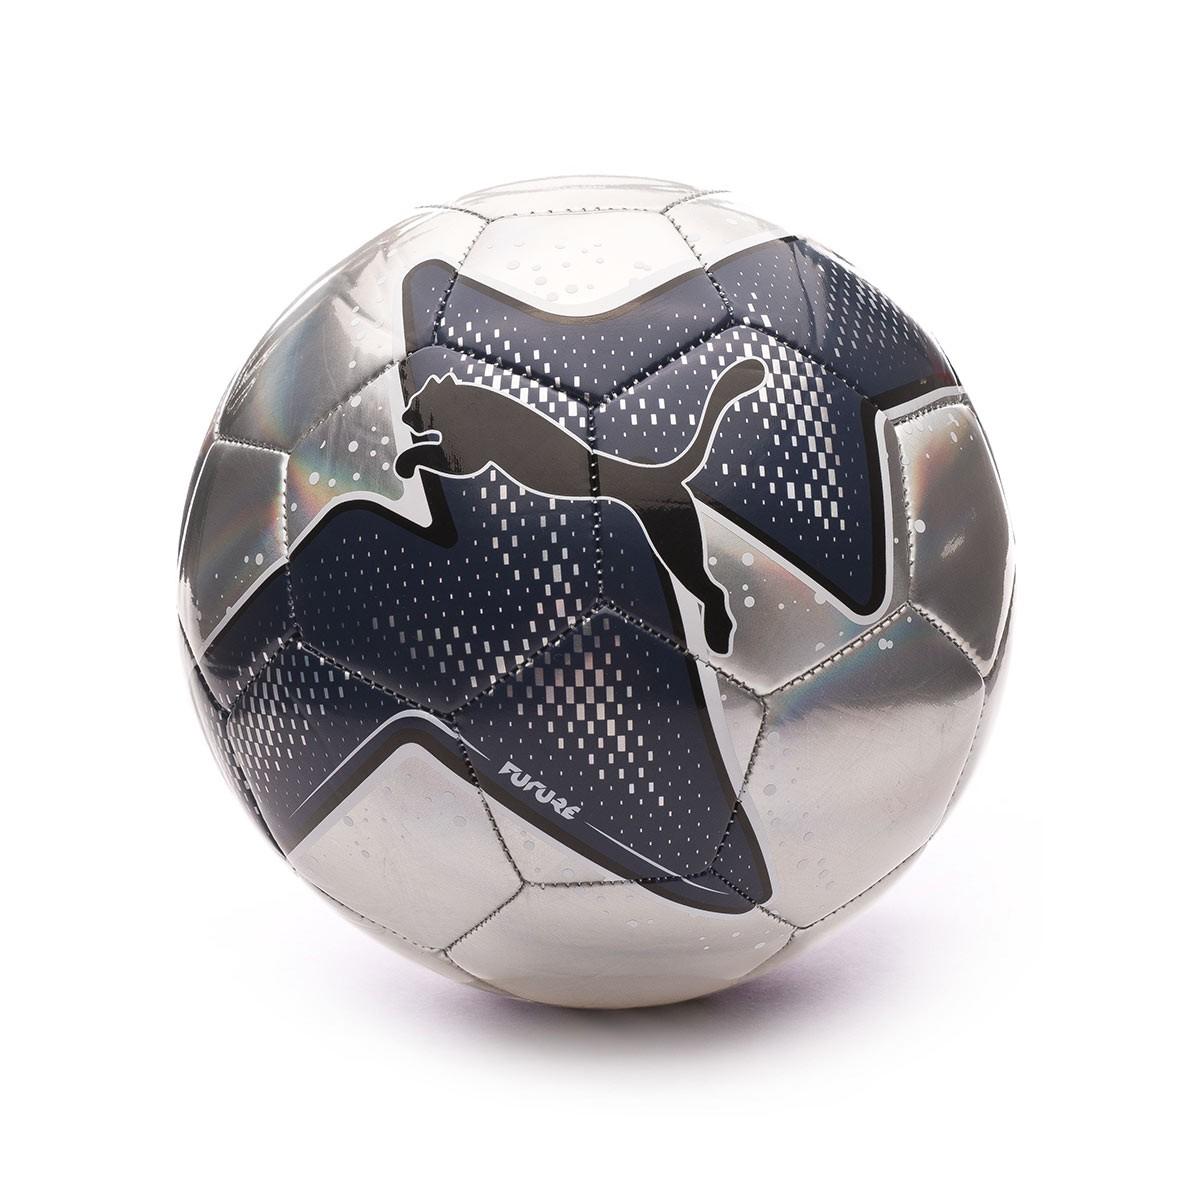 Ballon Puma Future Pulse Silver-Peacoat-Puma Black - Fútbol Emotion